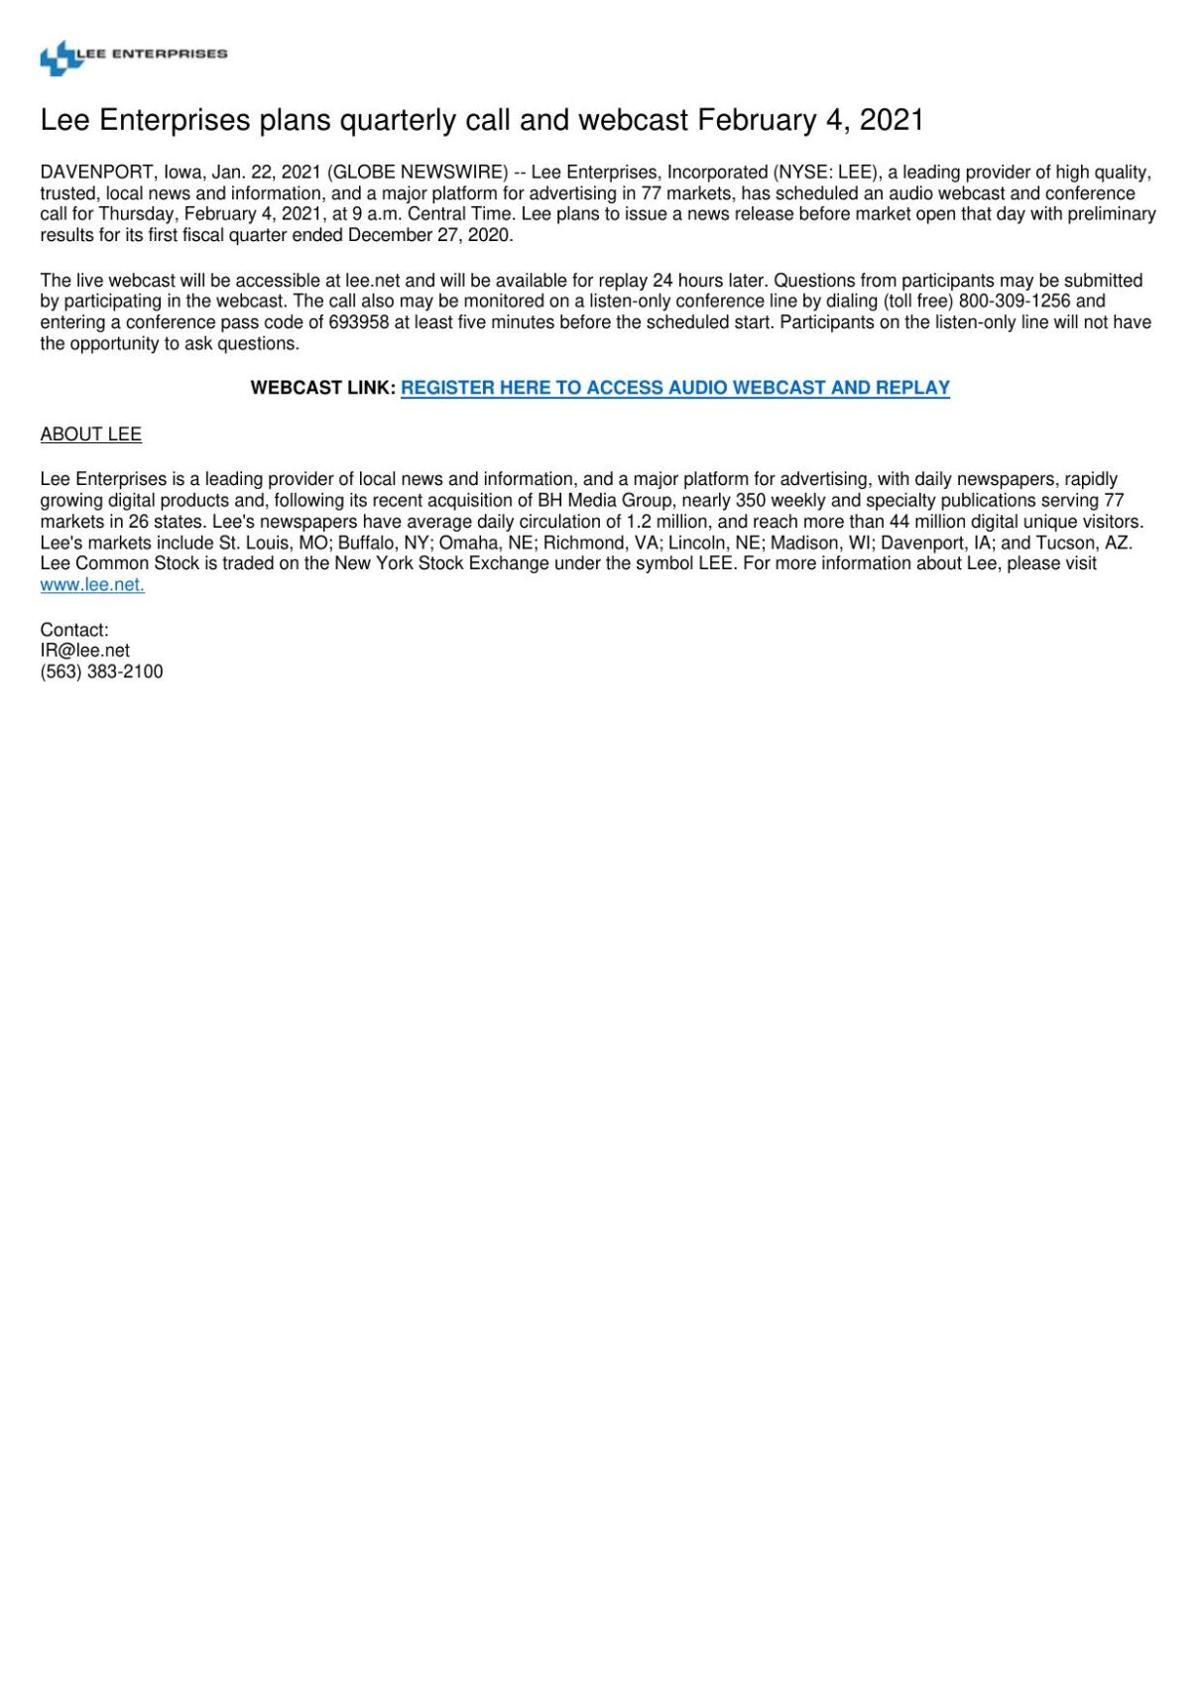 Lee Enterprises plans quarterly call and webcast February 4, 2021